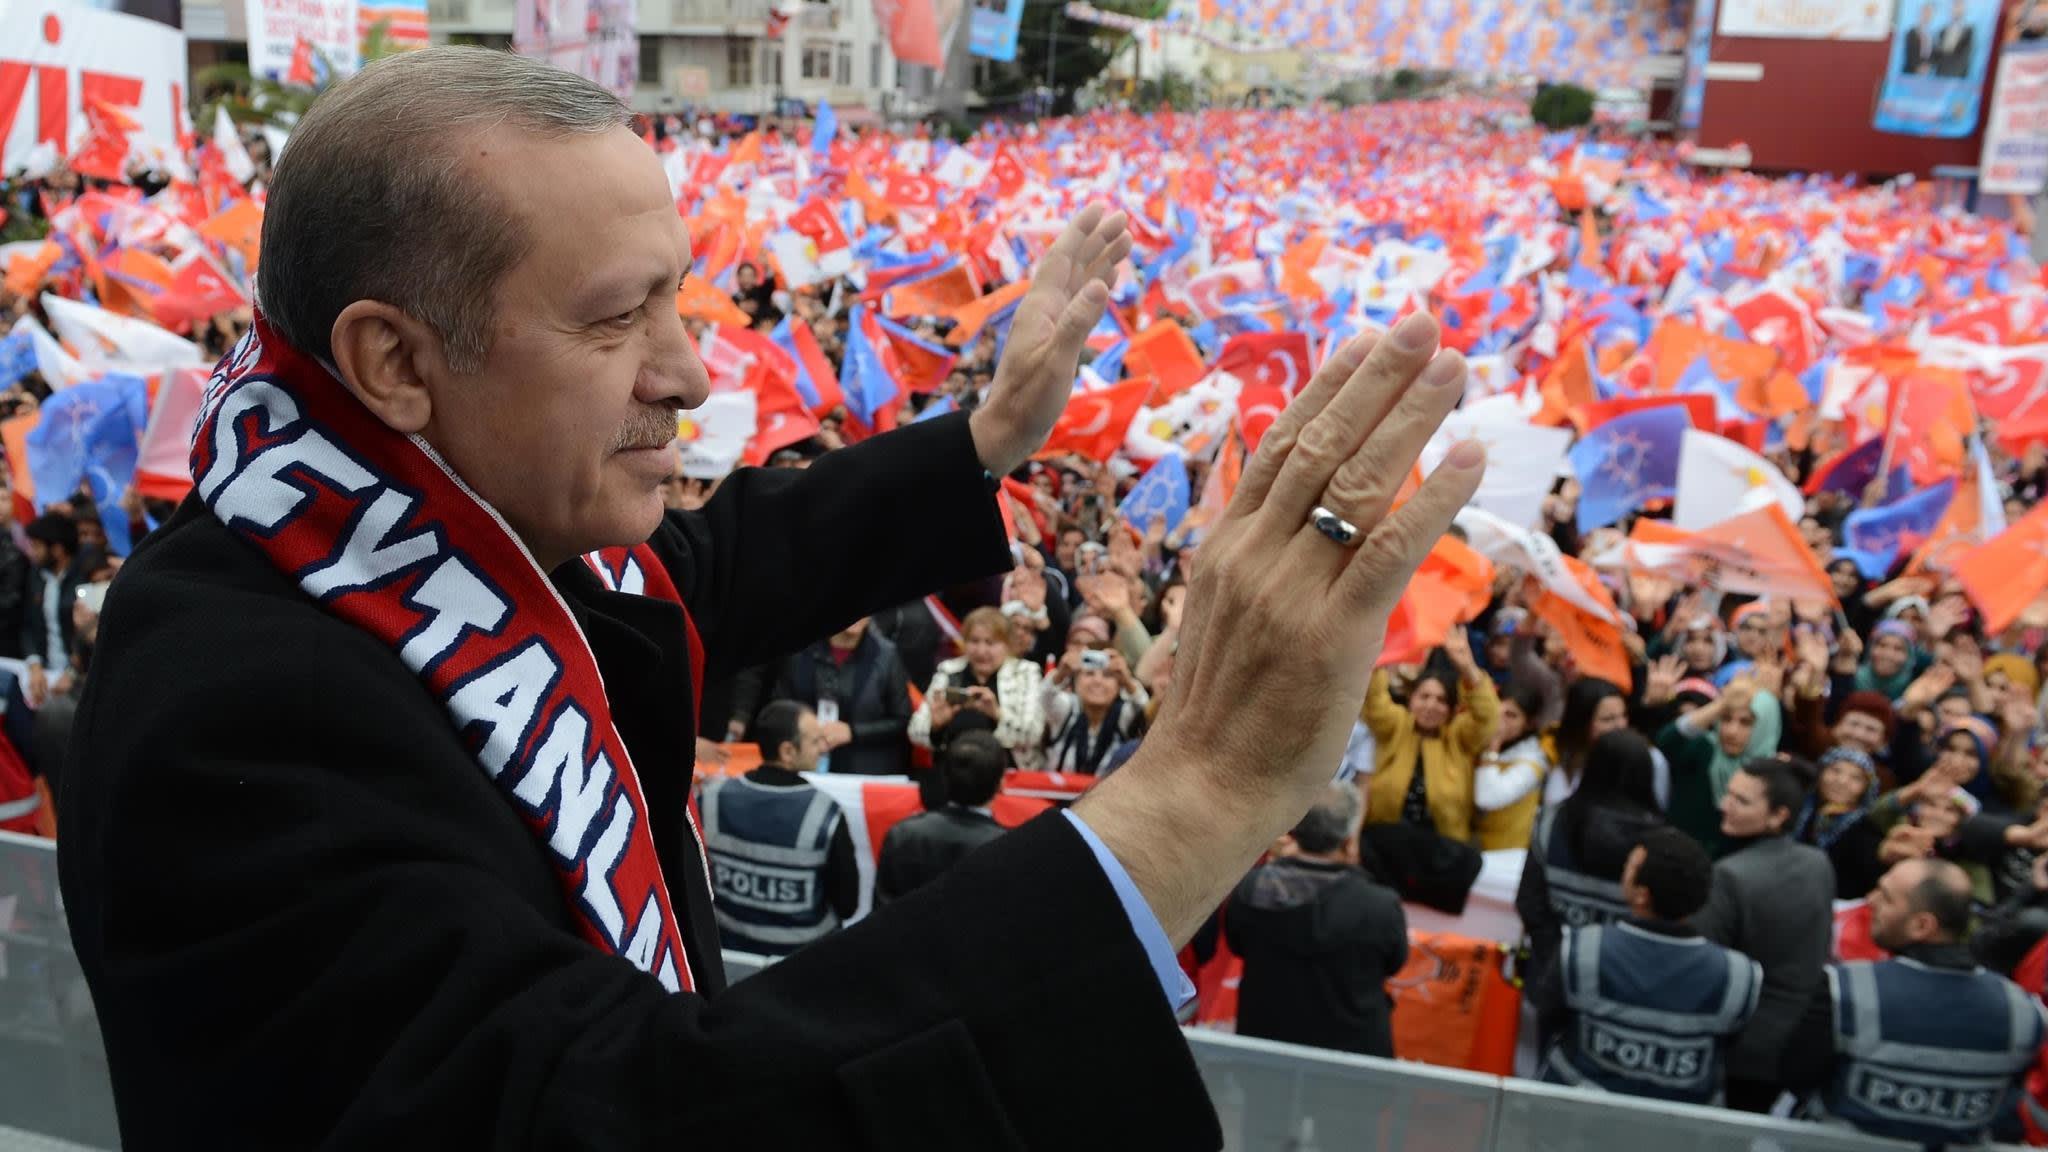 Recep Tayyip Erdogan's shallow version of democracy will falter   Financial Times